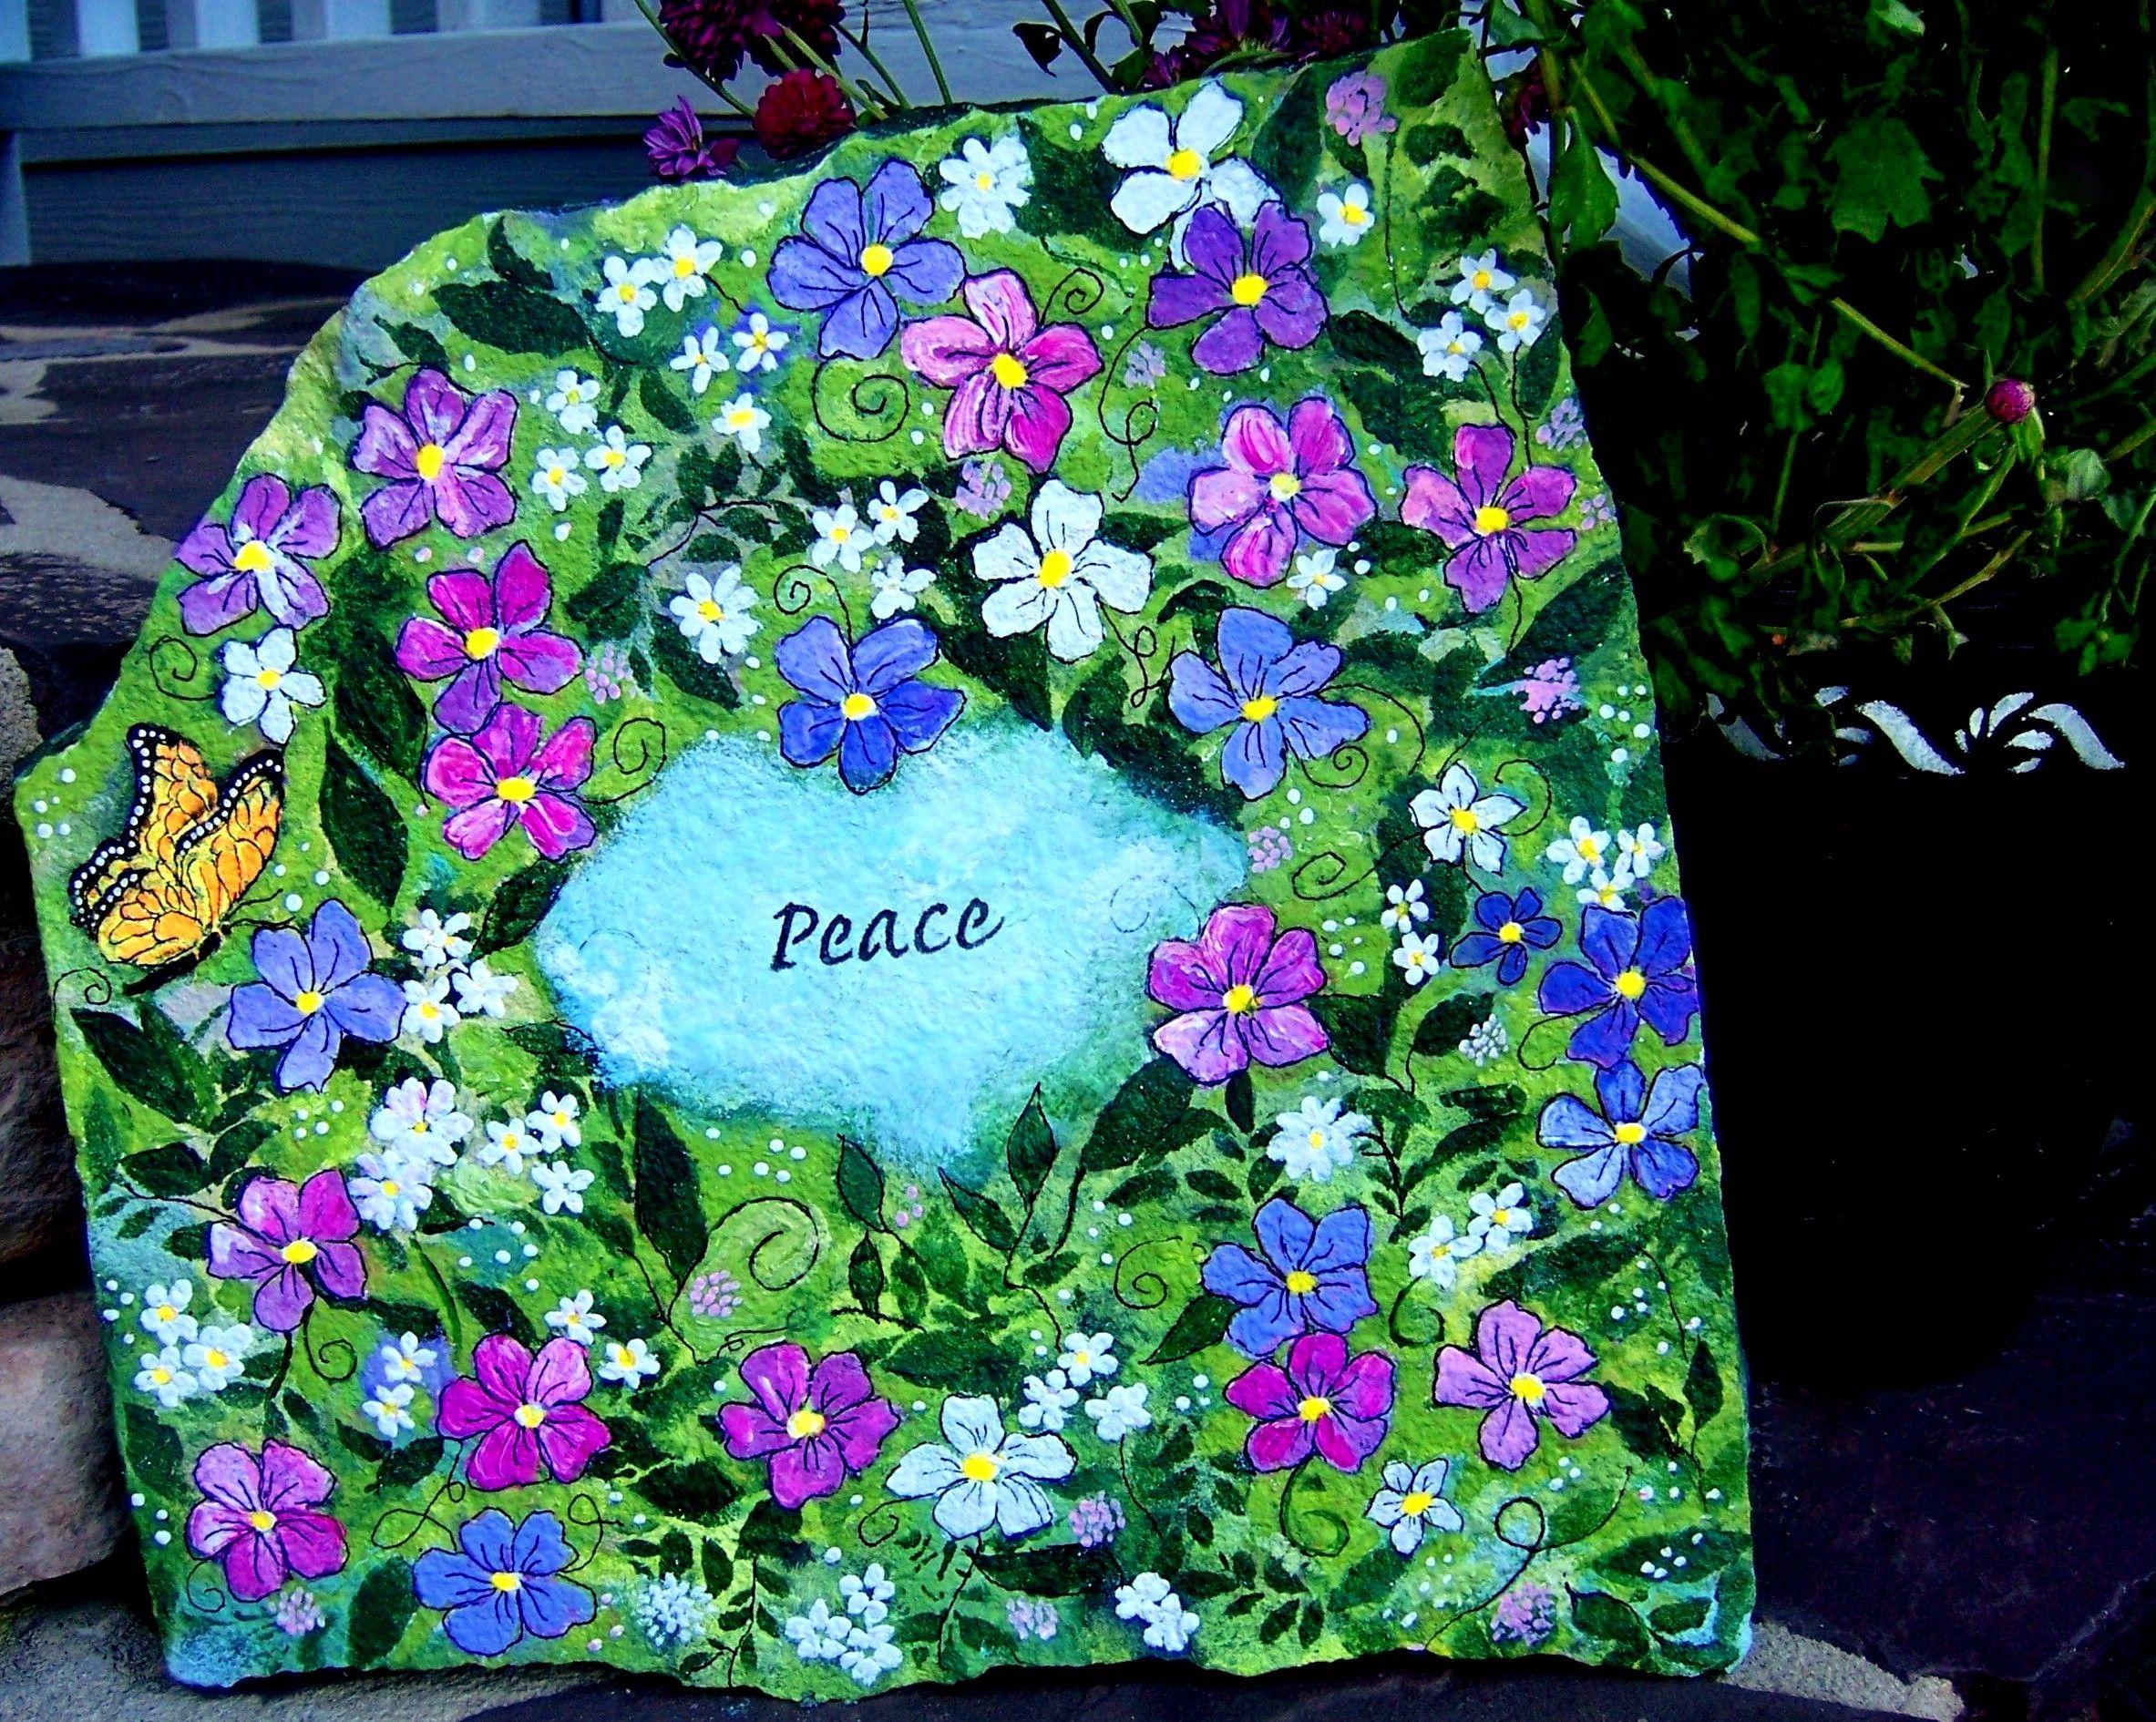 Hand-Painting Garden Rocks: Flowers and Fairies | Flower ...